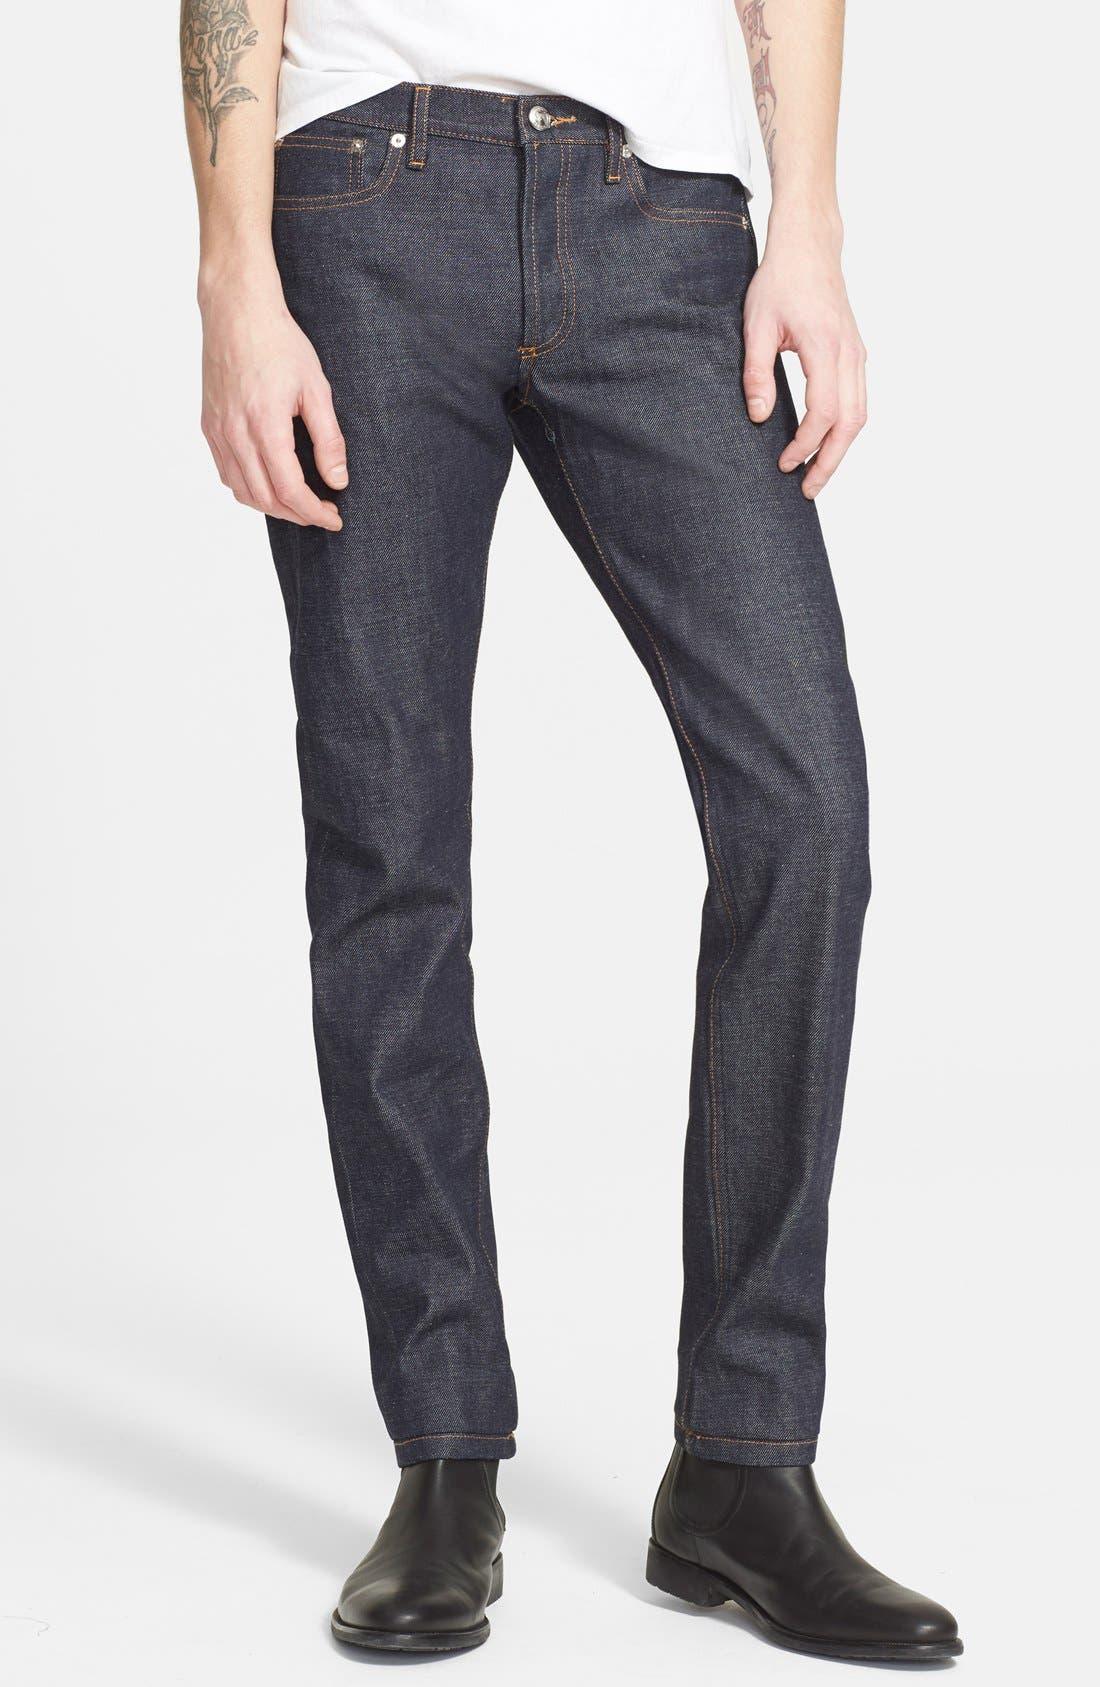 A.P.C. Petit New Standard Slim Straight Leg Selvedge Jeans